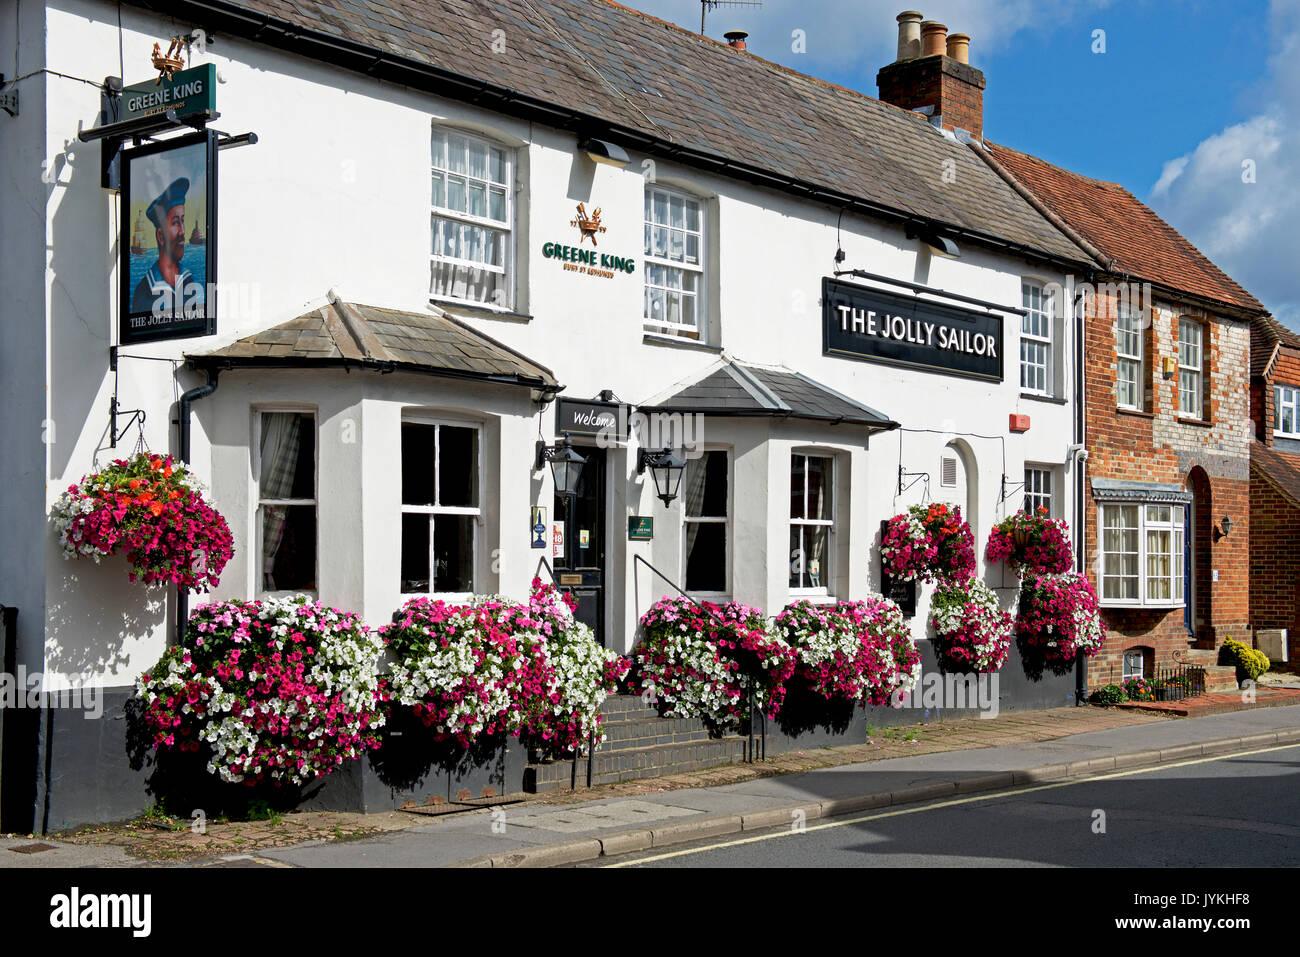 The Jolly Sailor pub, West Street, Farnham, Surrey, England UK - Stock Image